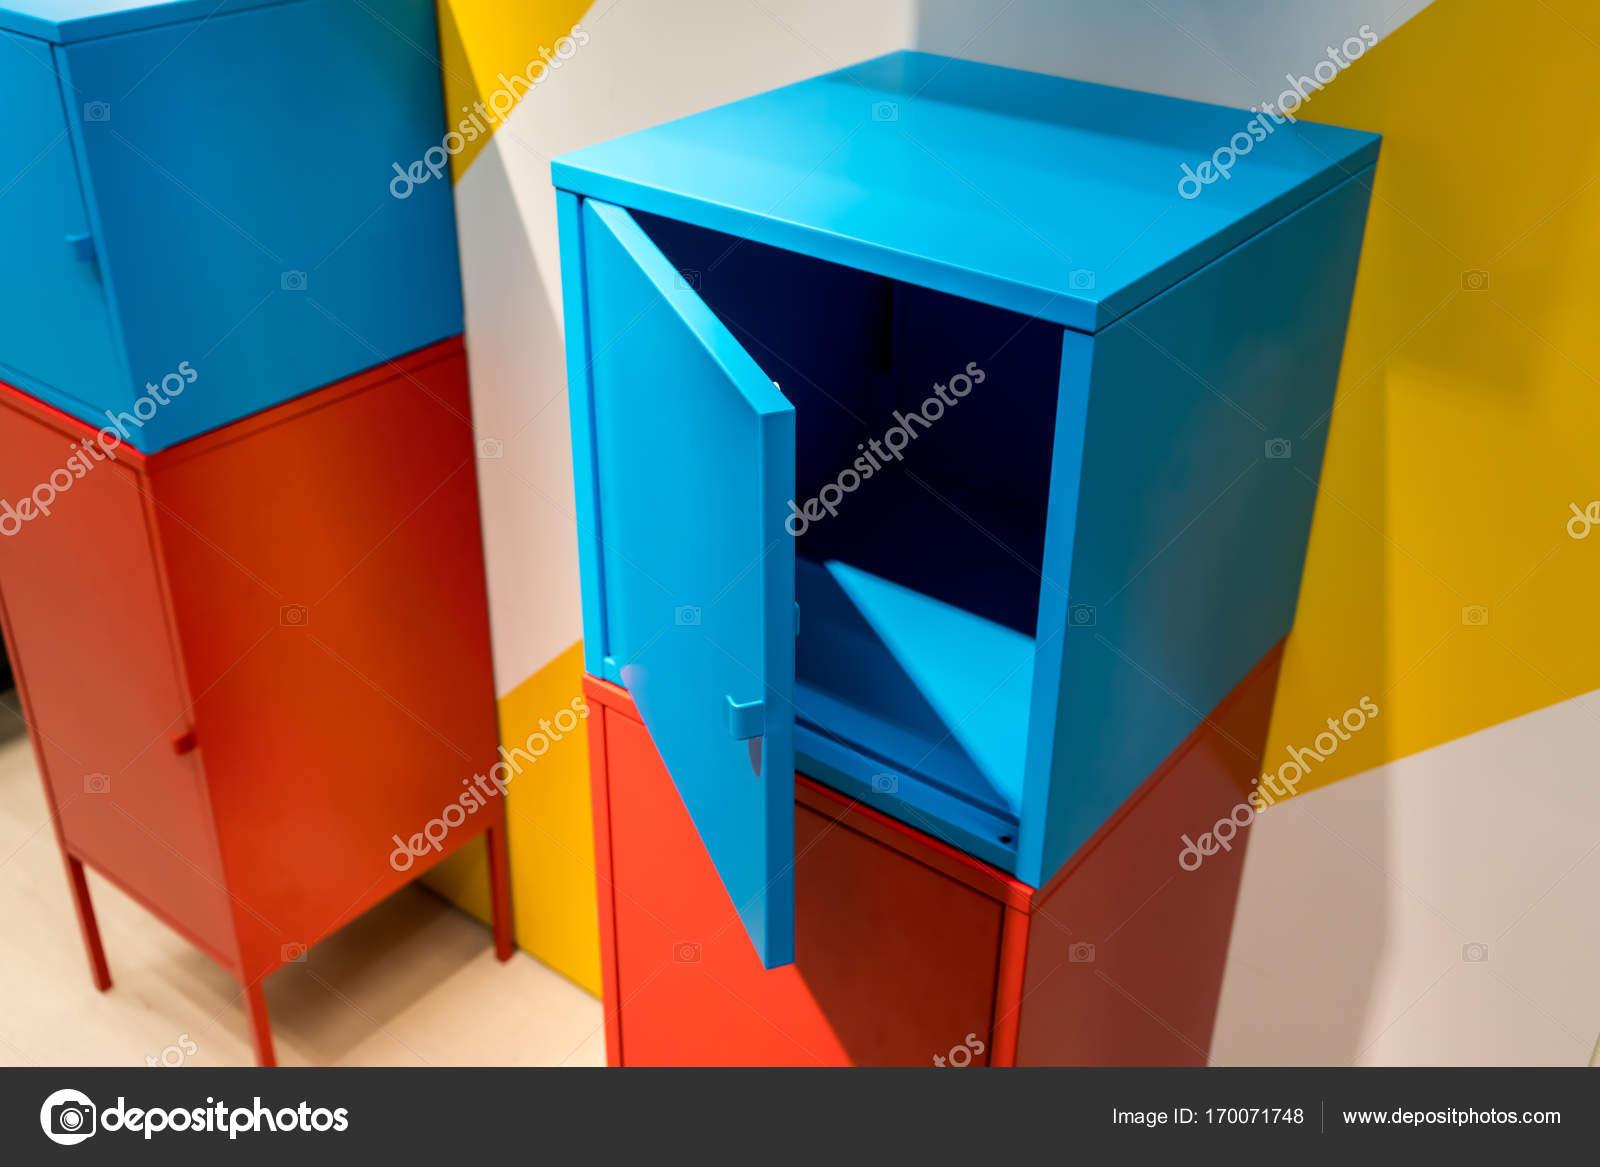 Bunte Metallschränke an Wand — Stockfoto © v74 #170071748